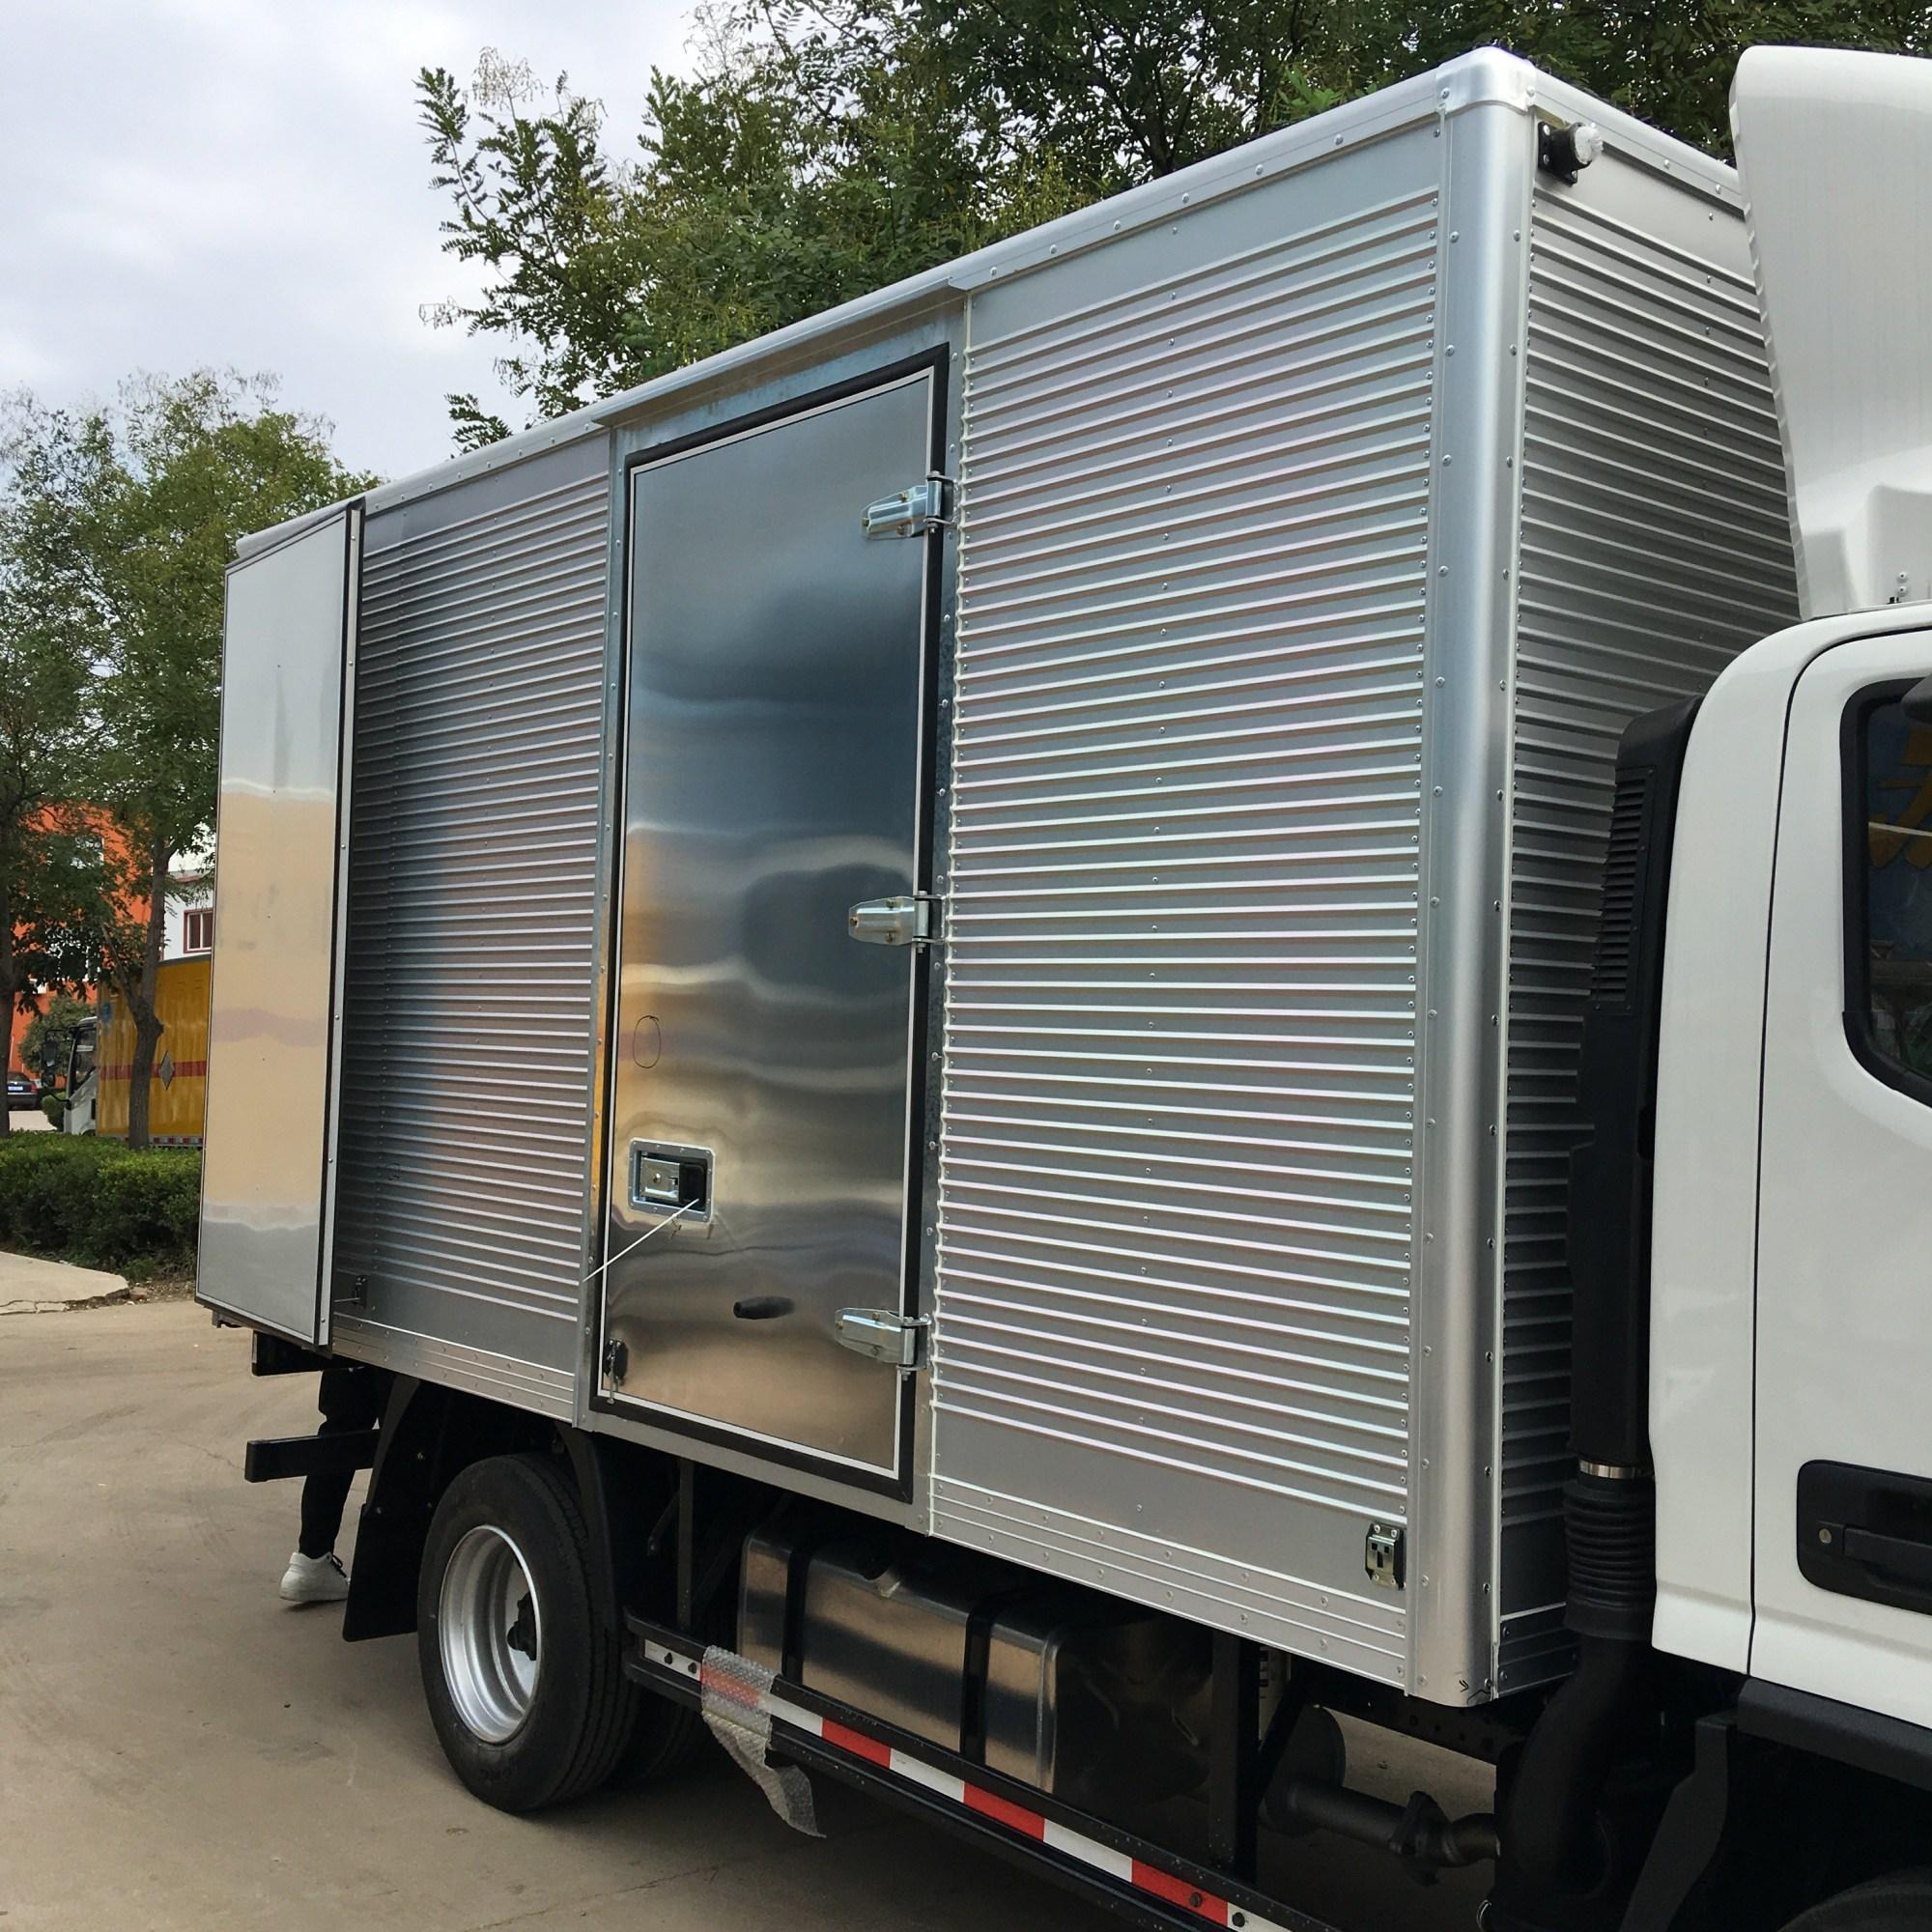 hight resolution of aluminium truck box truck panel body dry cargo van body view aluminum cargo box joyfly product details from zhucheng joyfly imp exp company limited on